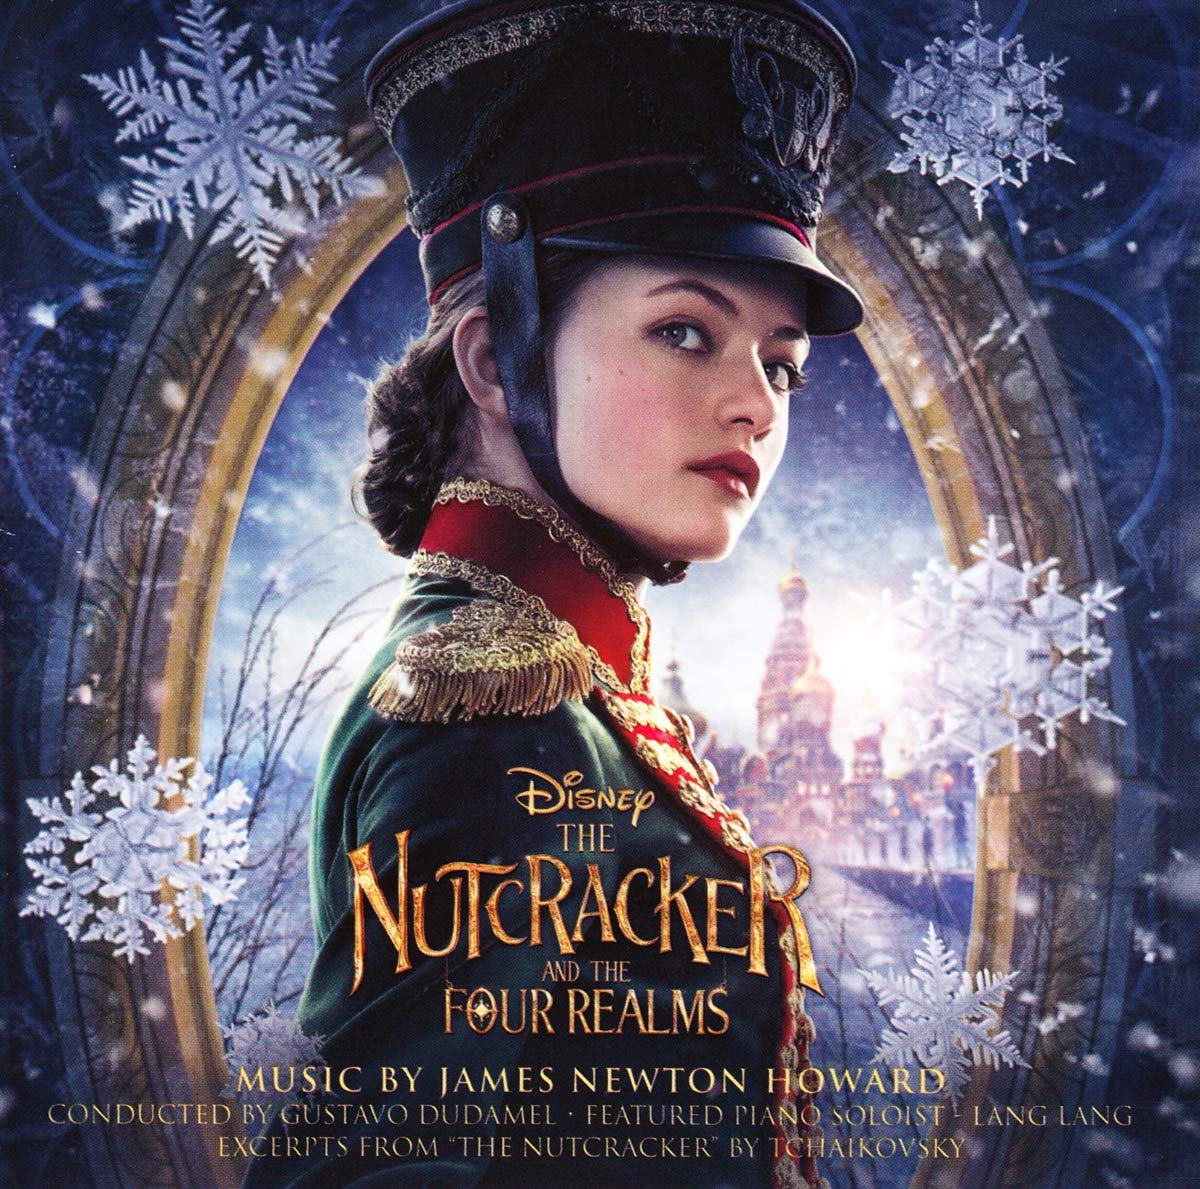 James Newton Howard The Nutcracker And The Four Realms Amazon Com Music